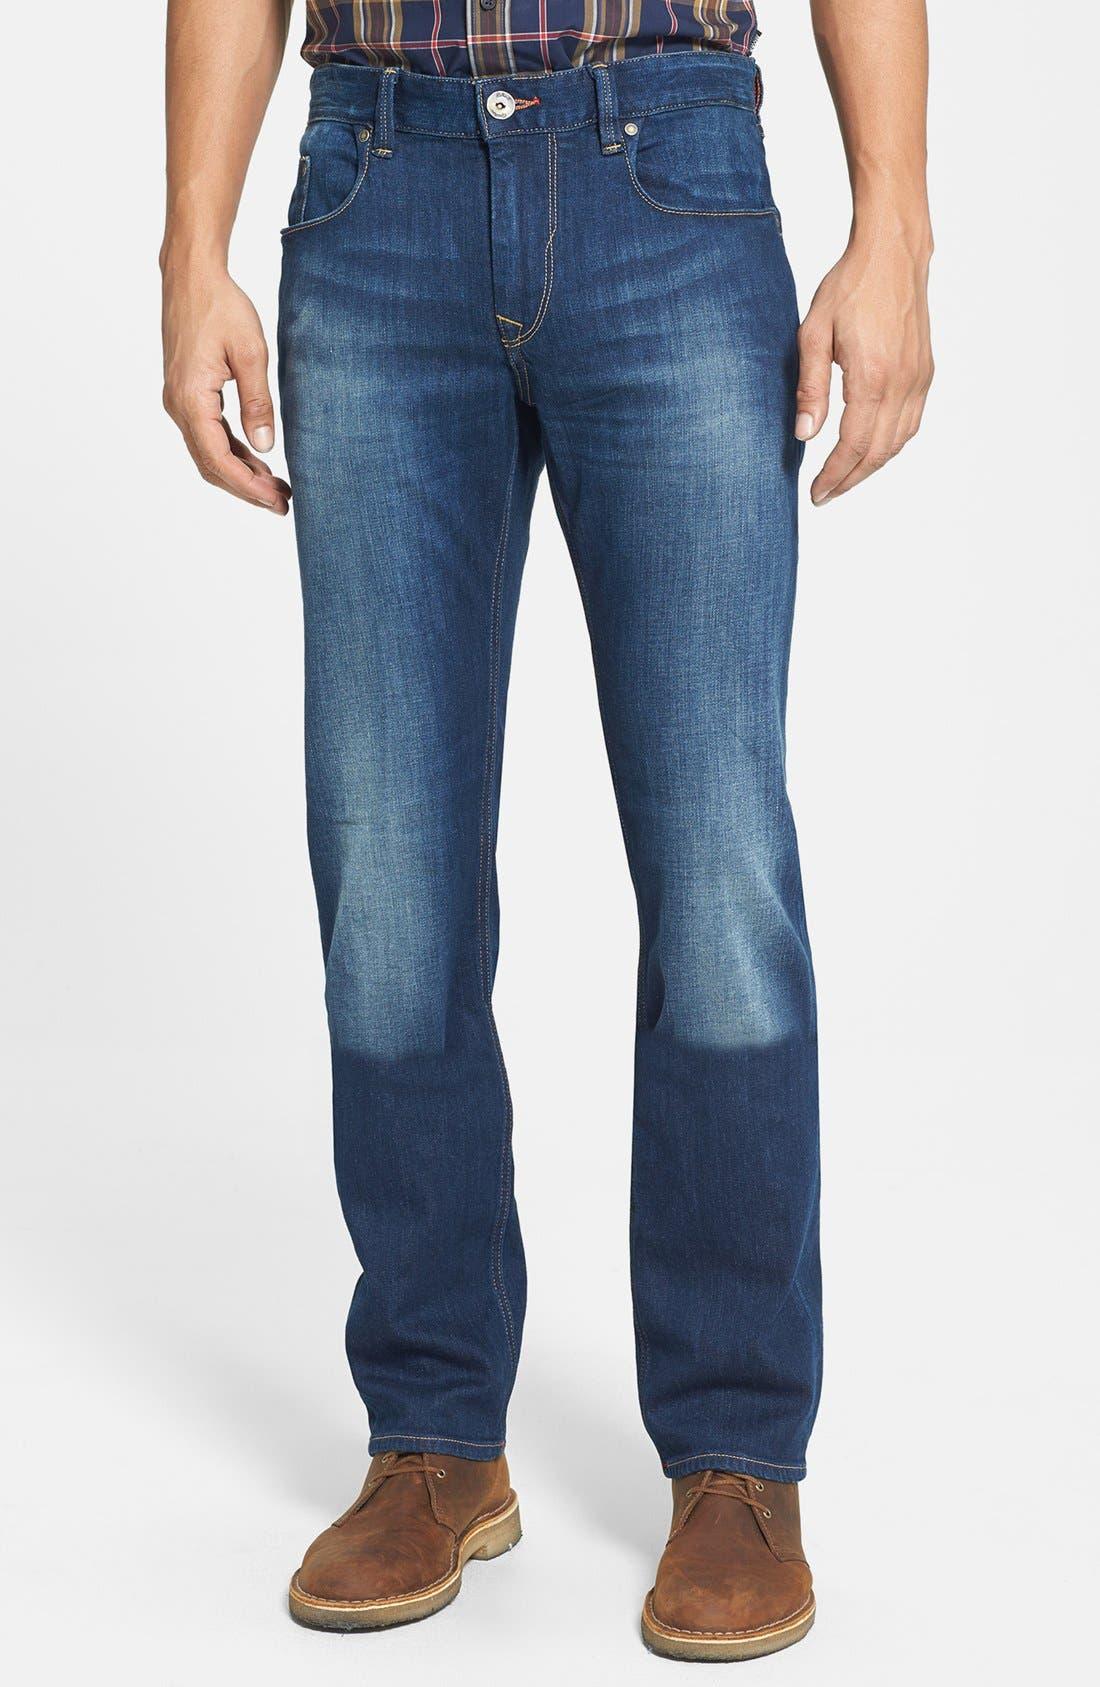 Alternate Image 1 Selected - Robert Graham 'Upside Down' Slim Fit Straight Leg Jeans